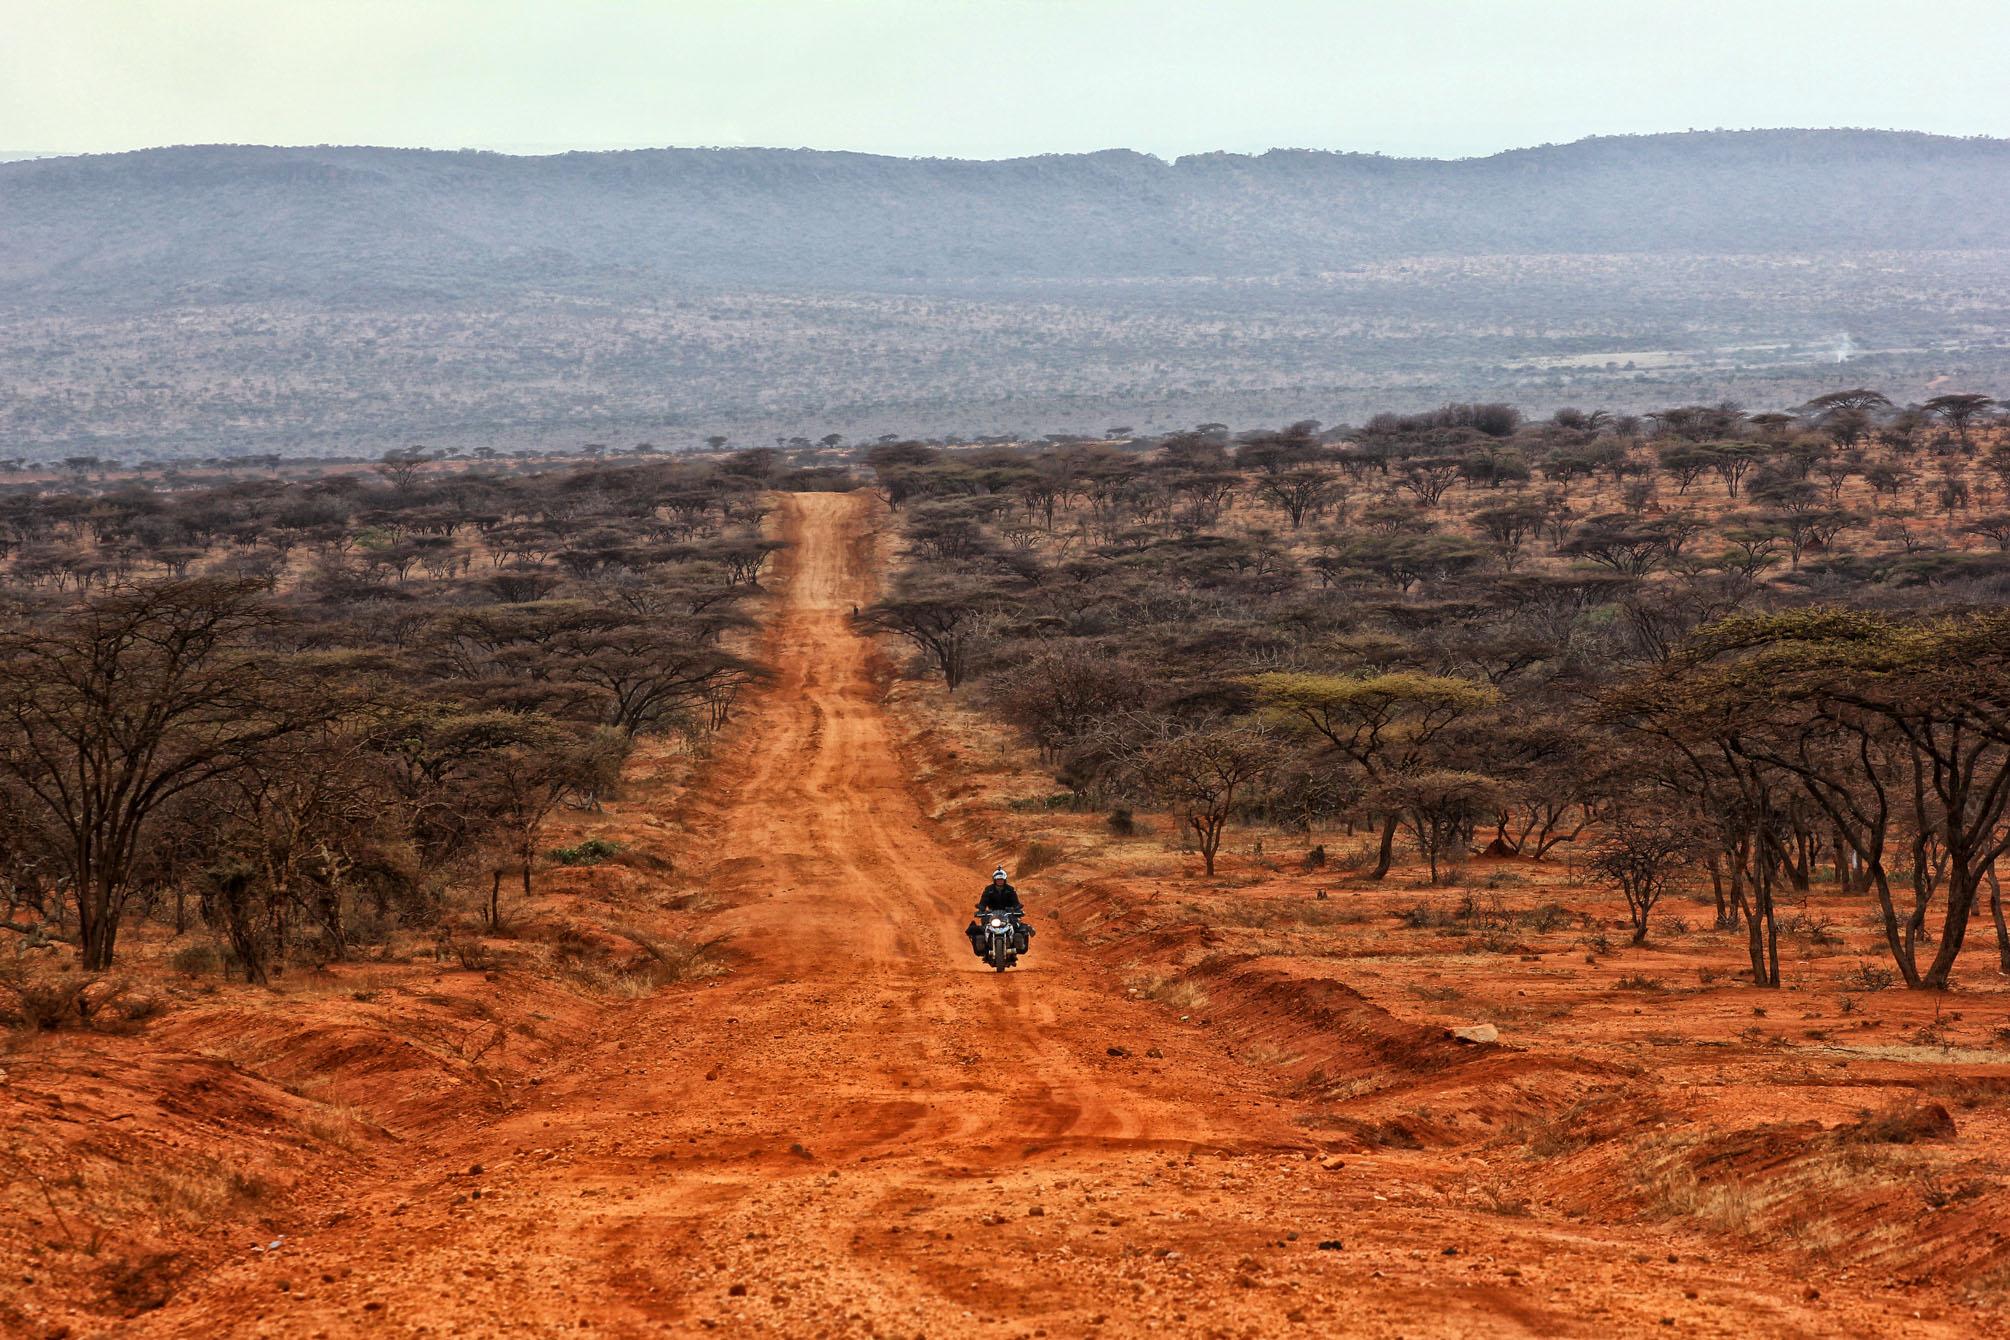 Kenya - Frank Lindert